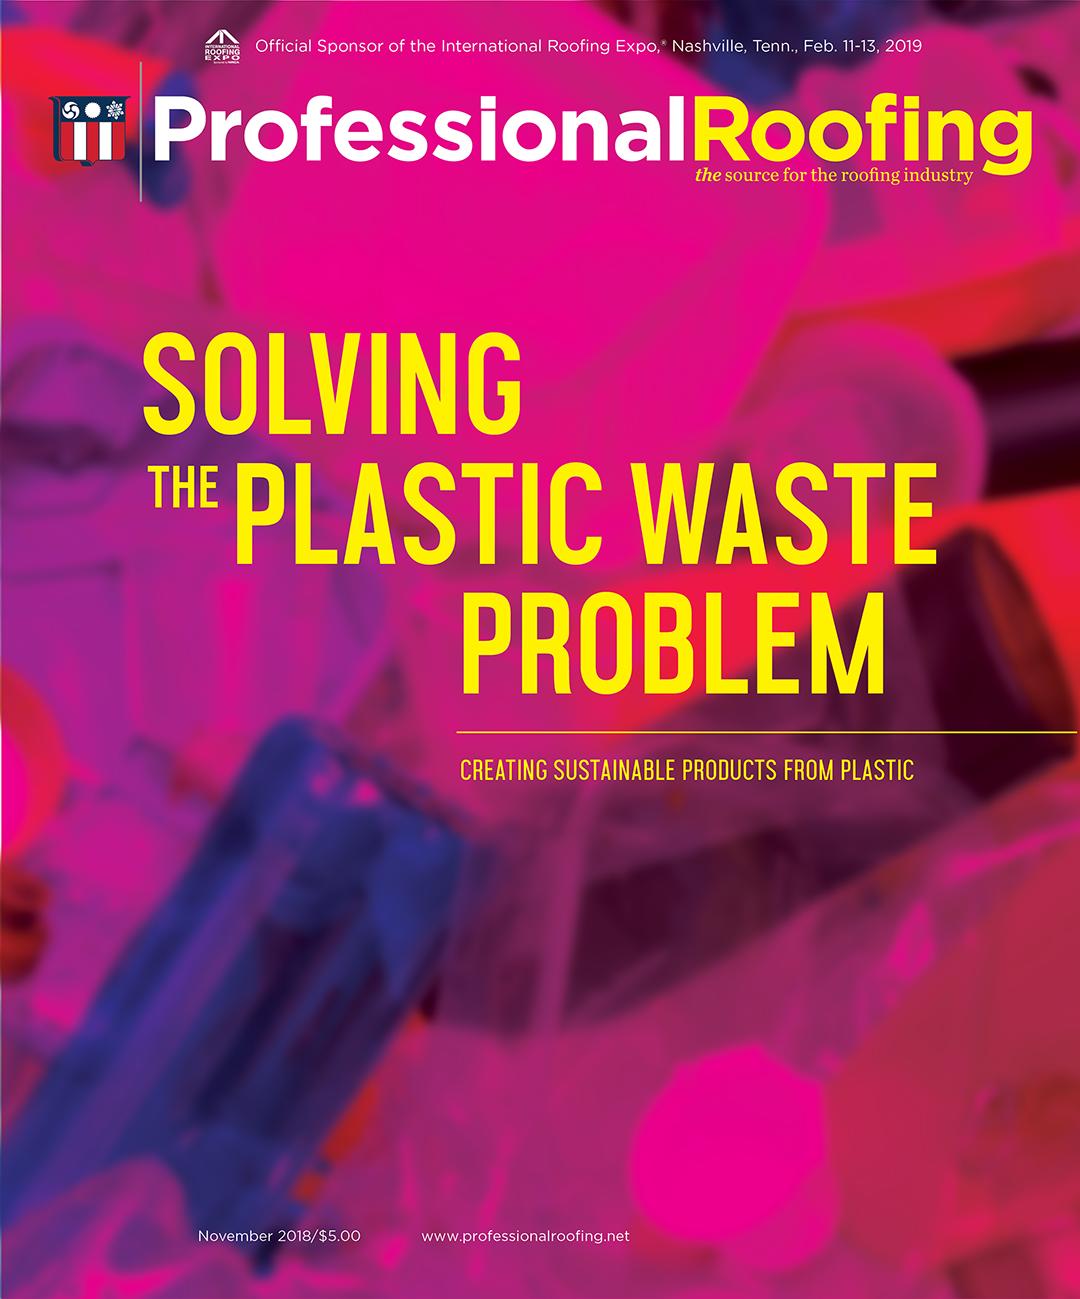 Professional Roofing Magazine 11/1/2018